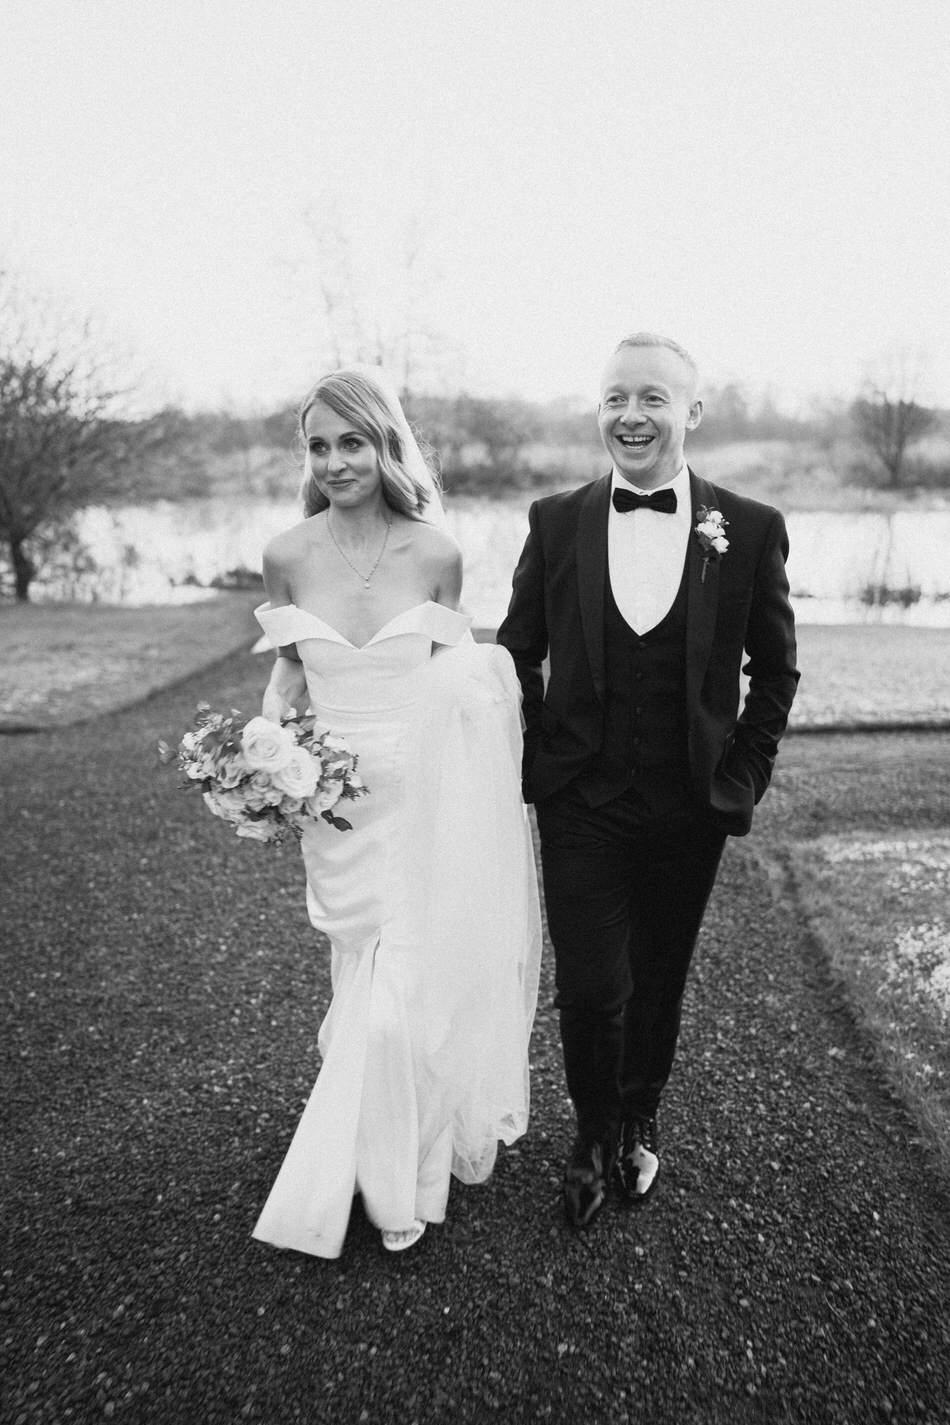 Castle-wedding-ireland-photos- 0230 170